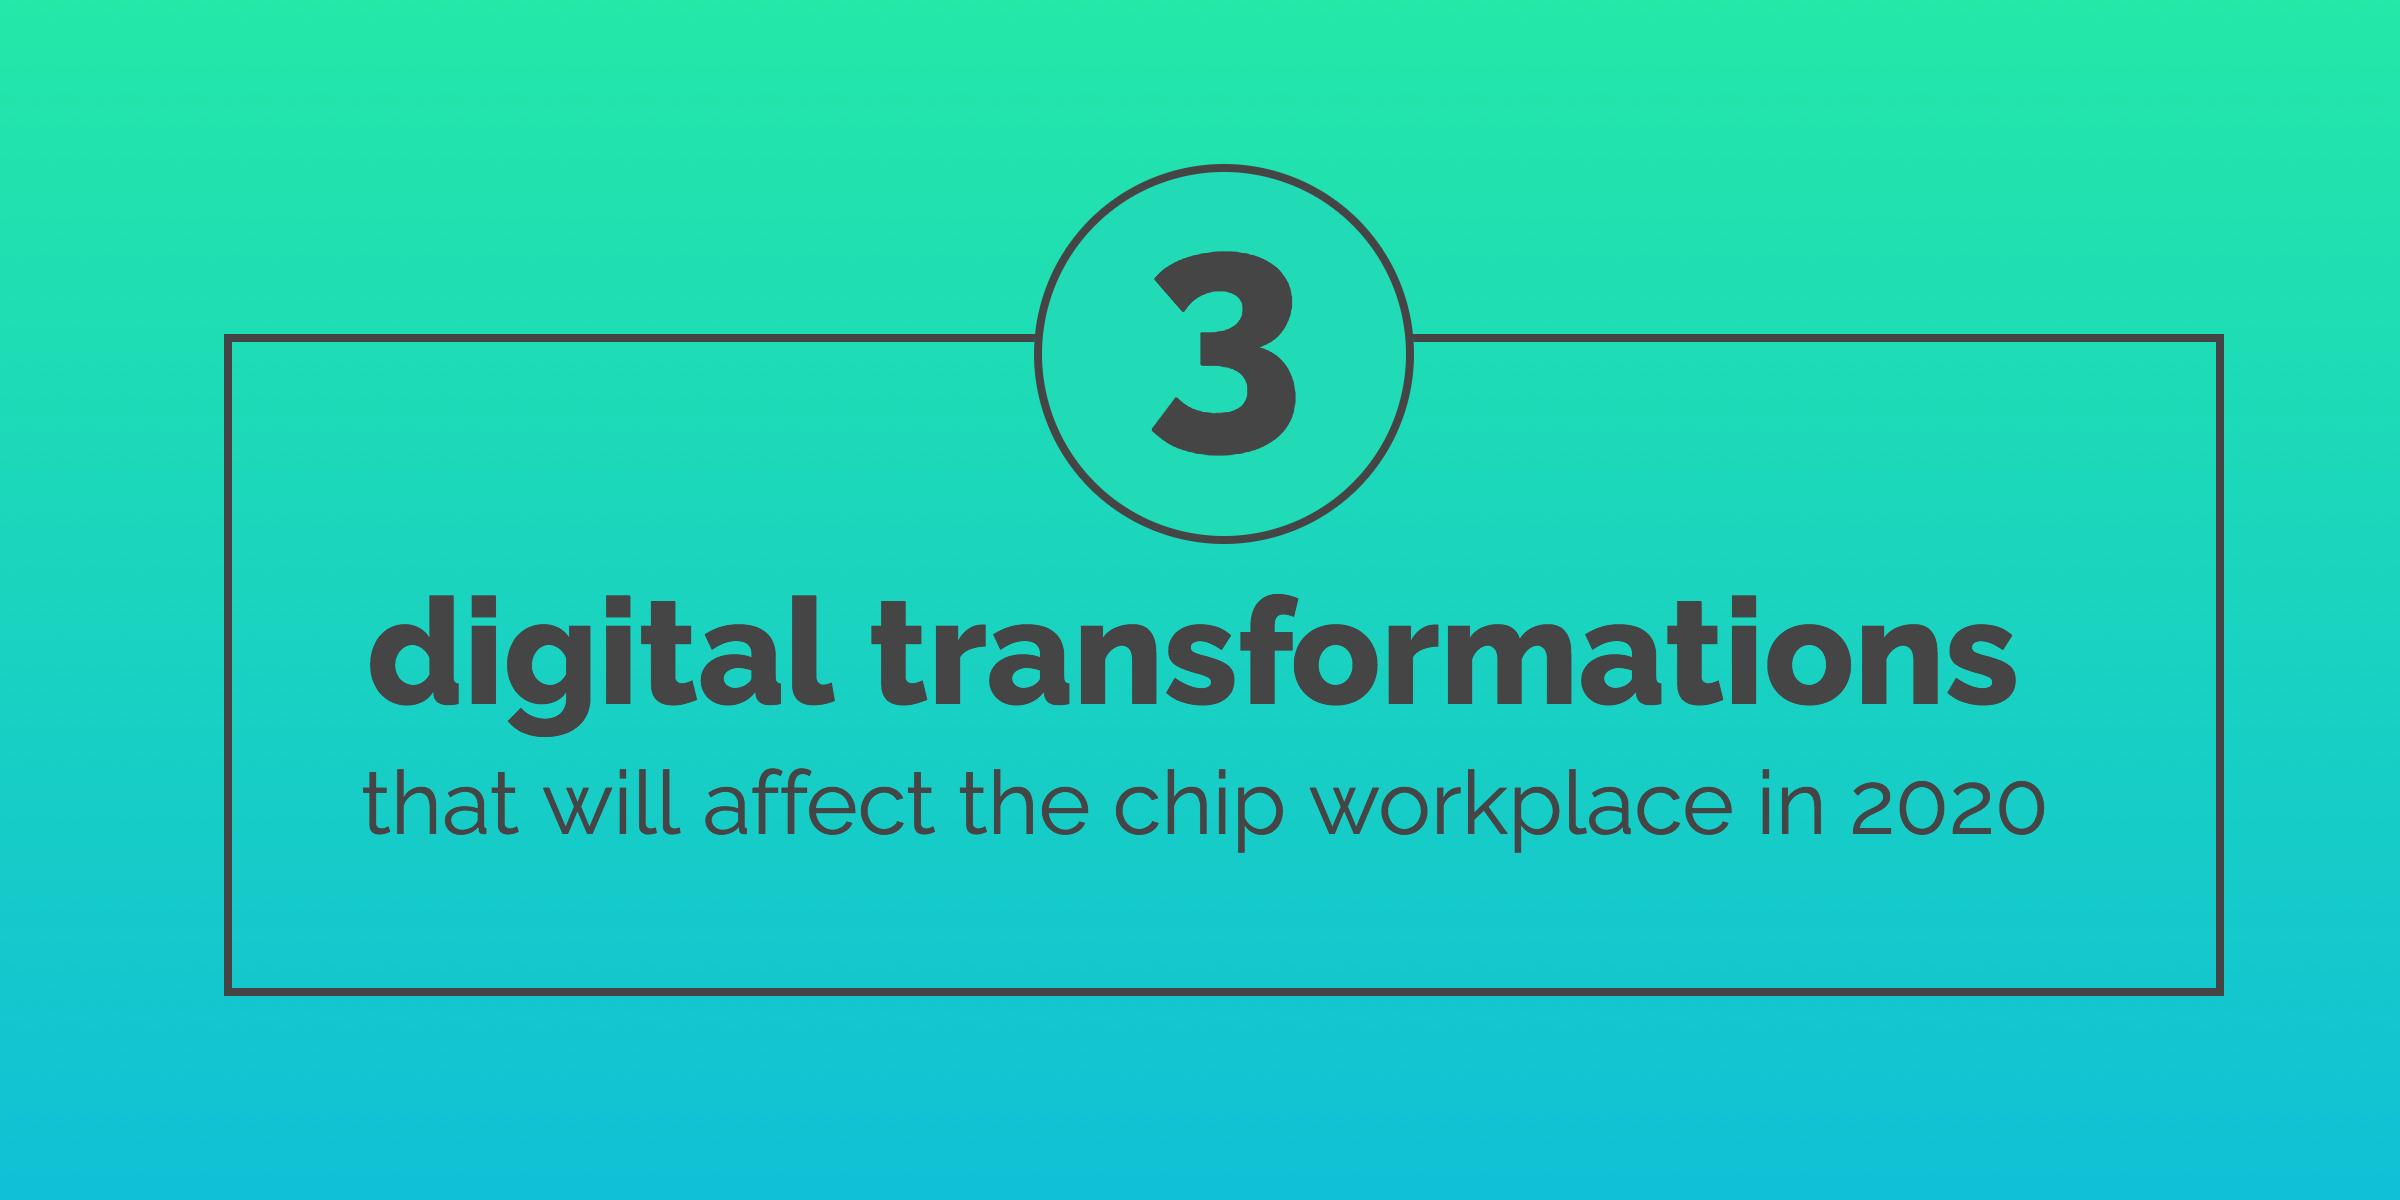 digital-transformations-chip-workplace-2020